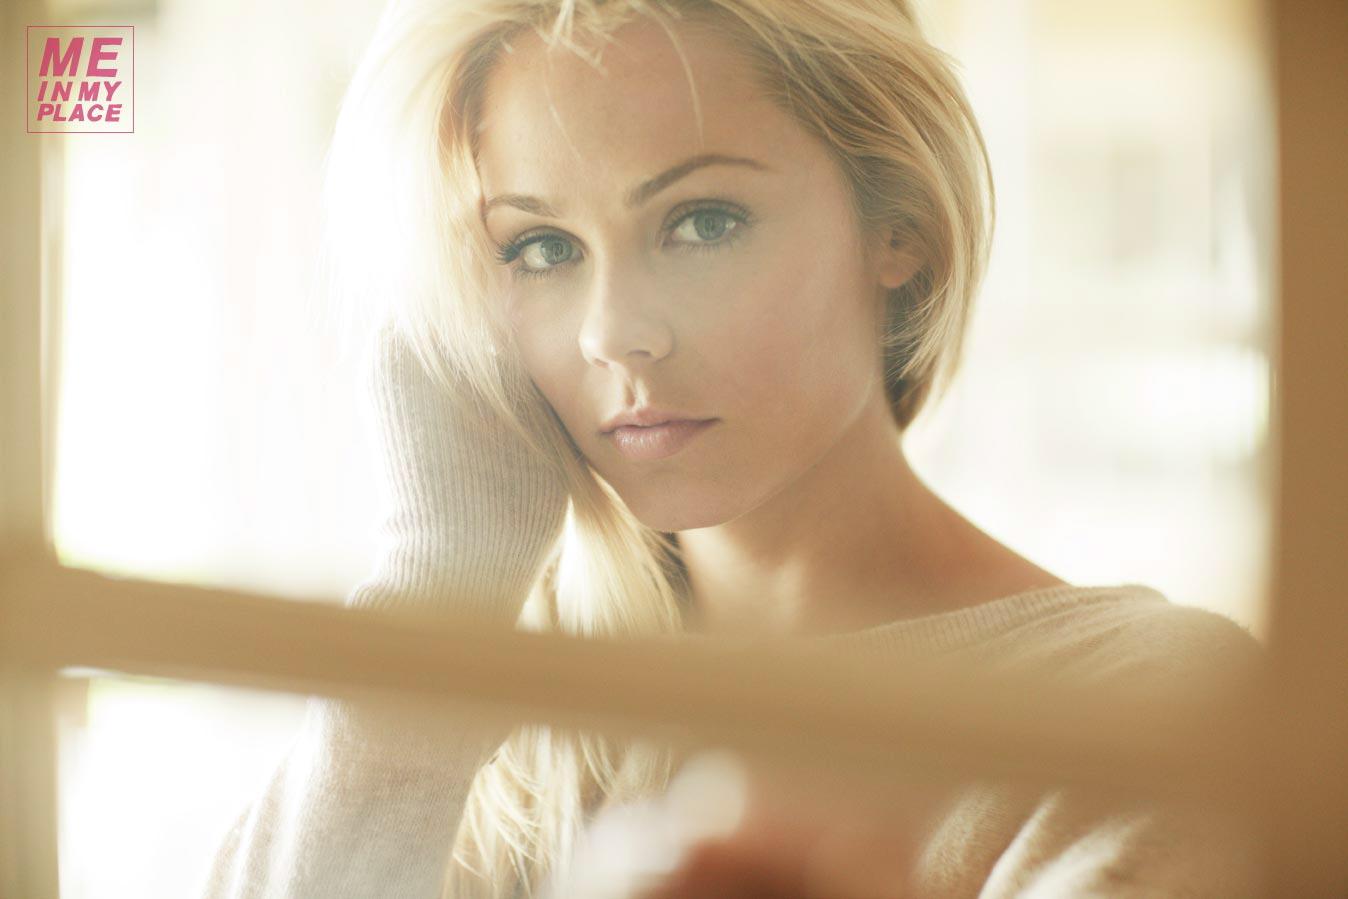 Laura+Vandervoort+-+Esquire+Magazine+%25